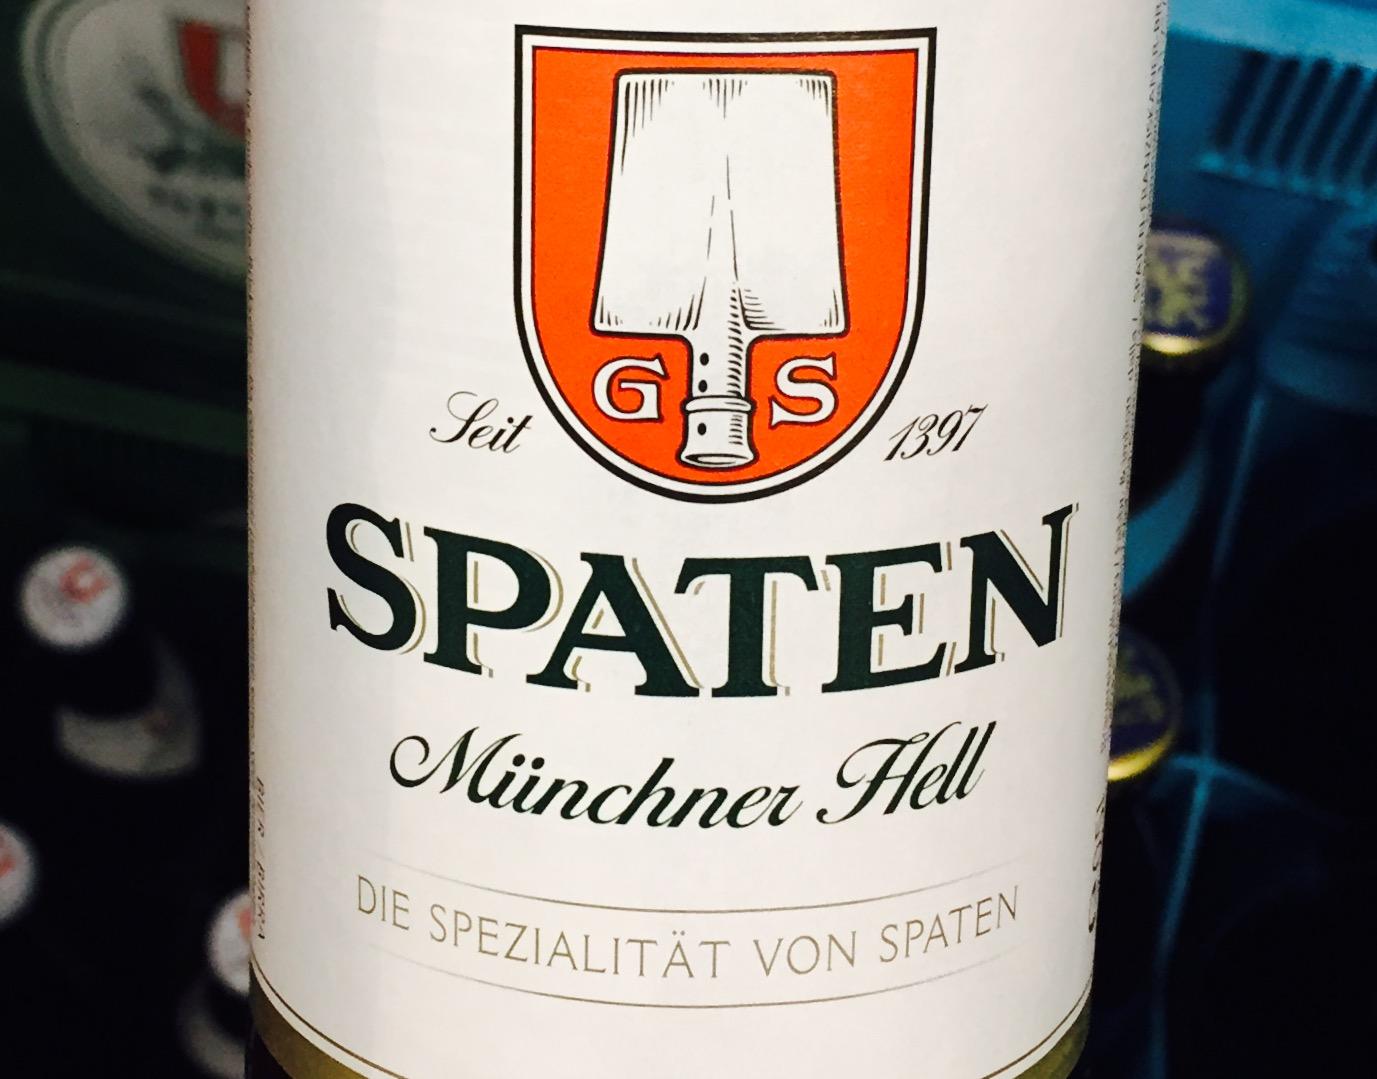 Spaten - Münchener Hell, Beer, Tasting, Rating, Bier, Verkostung, Bewertung, Alle Biere der Welt, hier bei BeerToGo